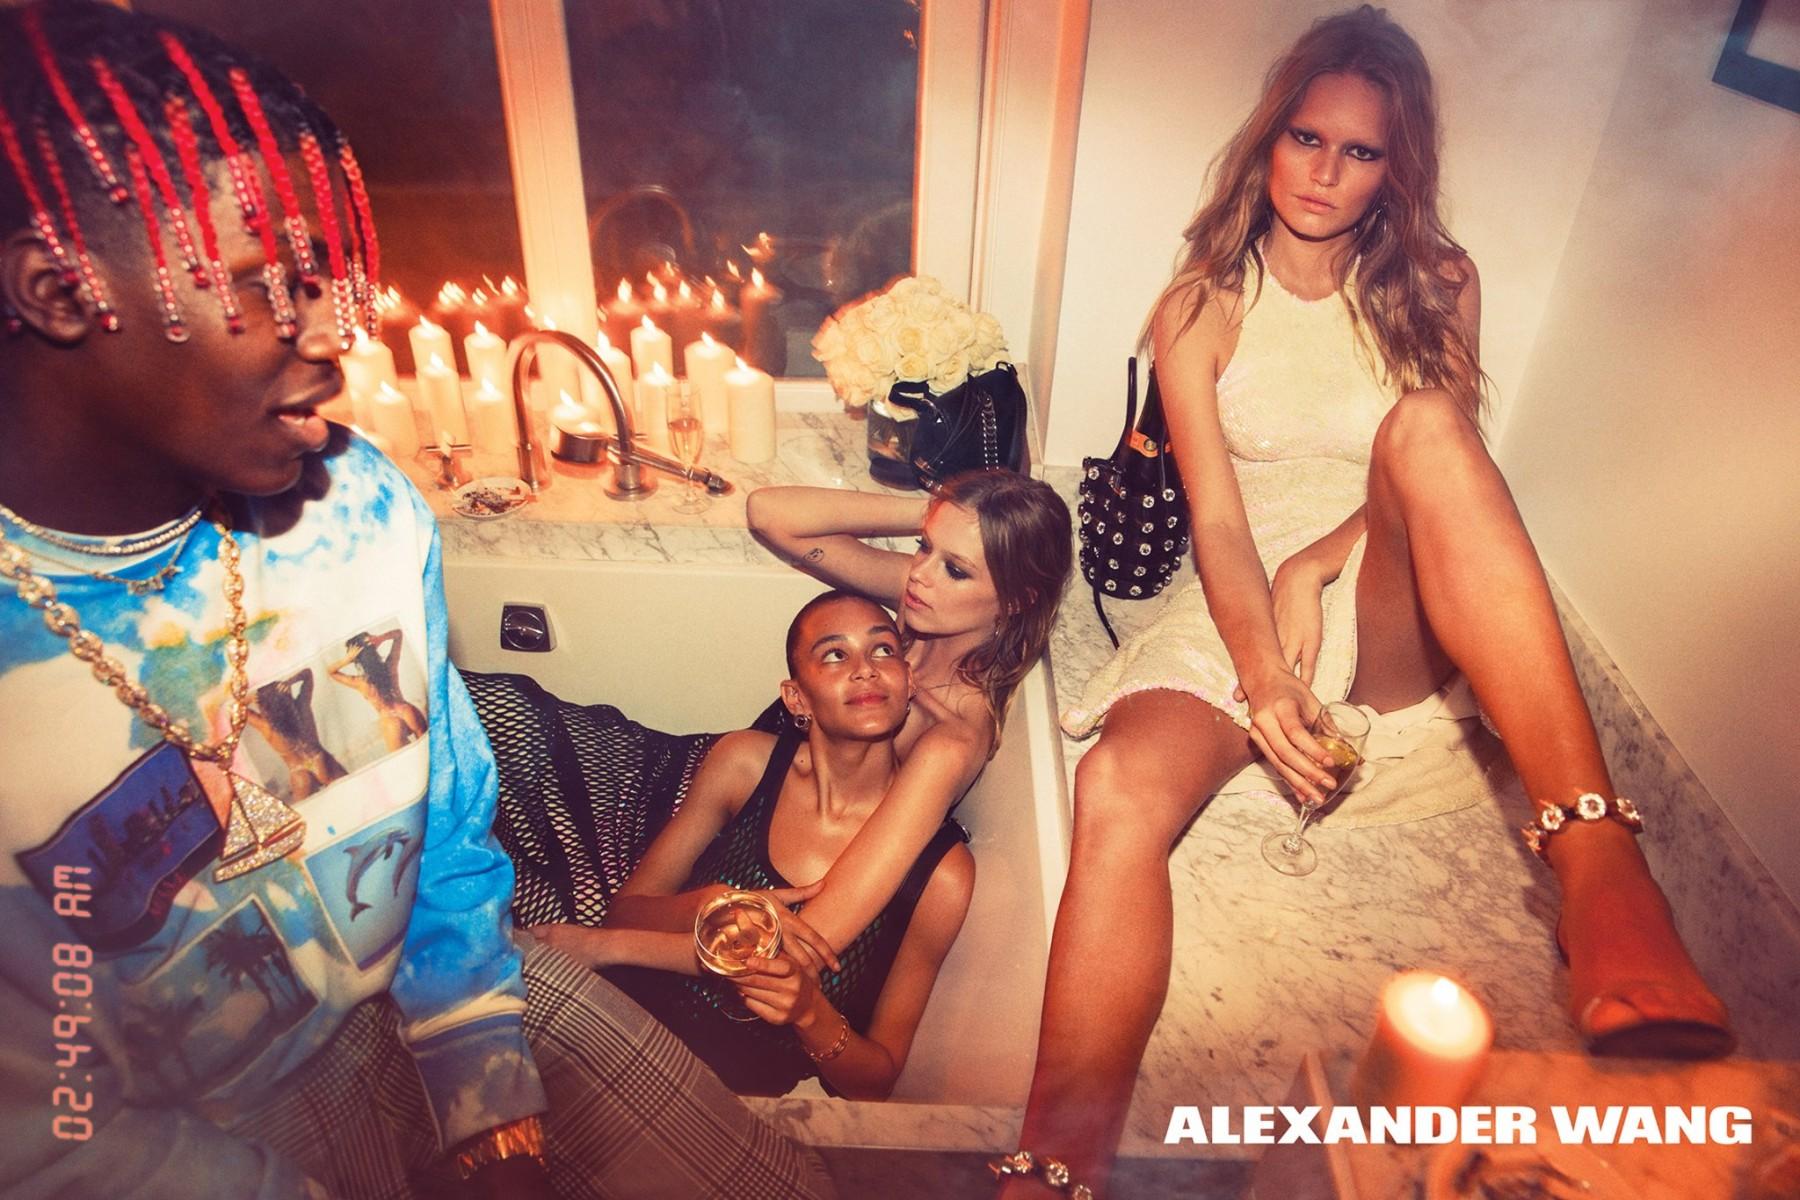 alexander-wang-lil-yachty-anna-ewers-lexi-boling-binx-walton-2-1800x1200